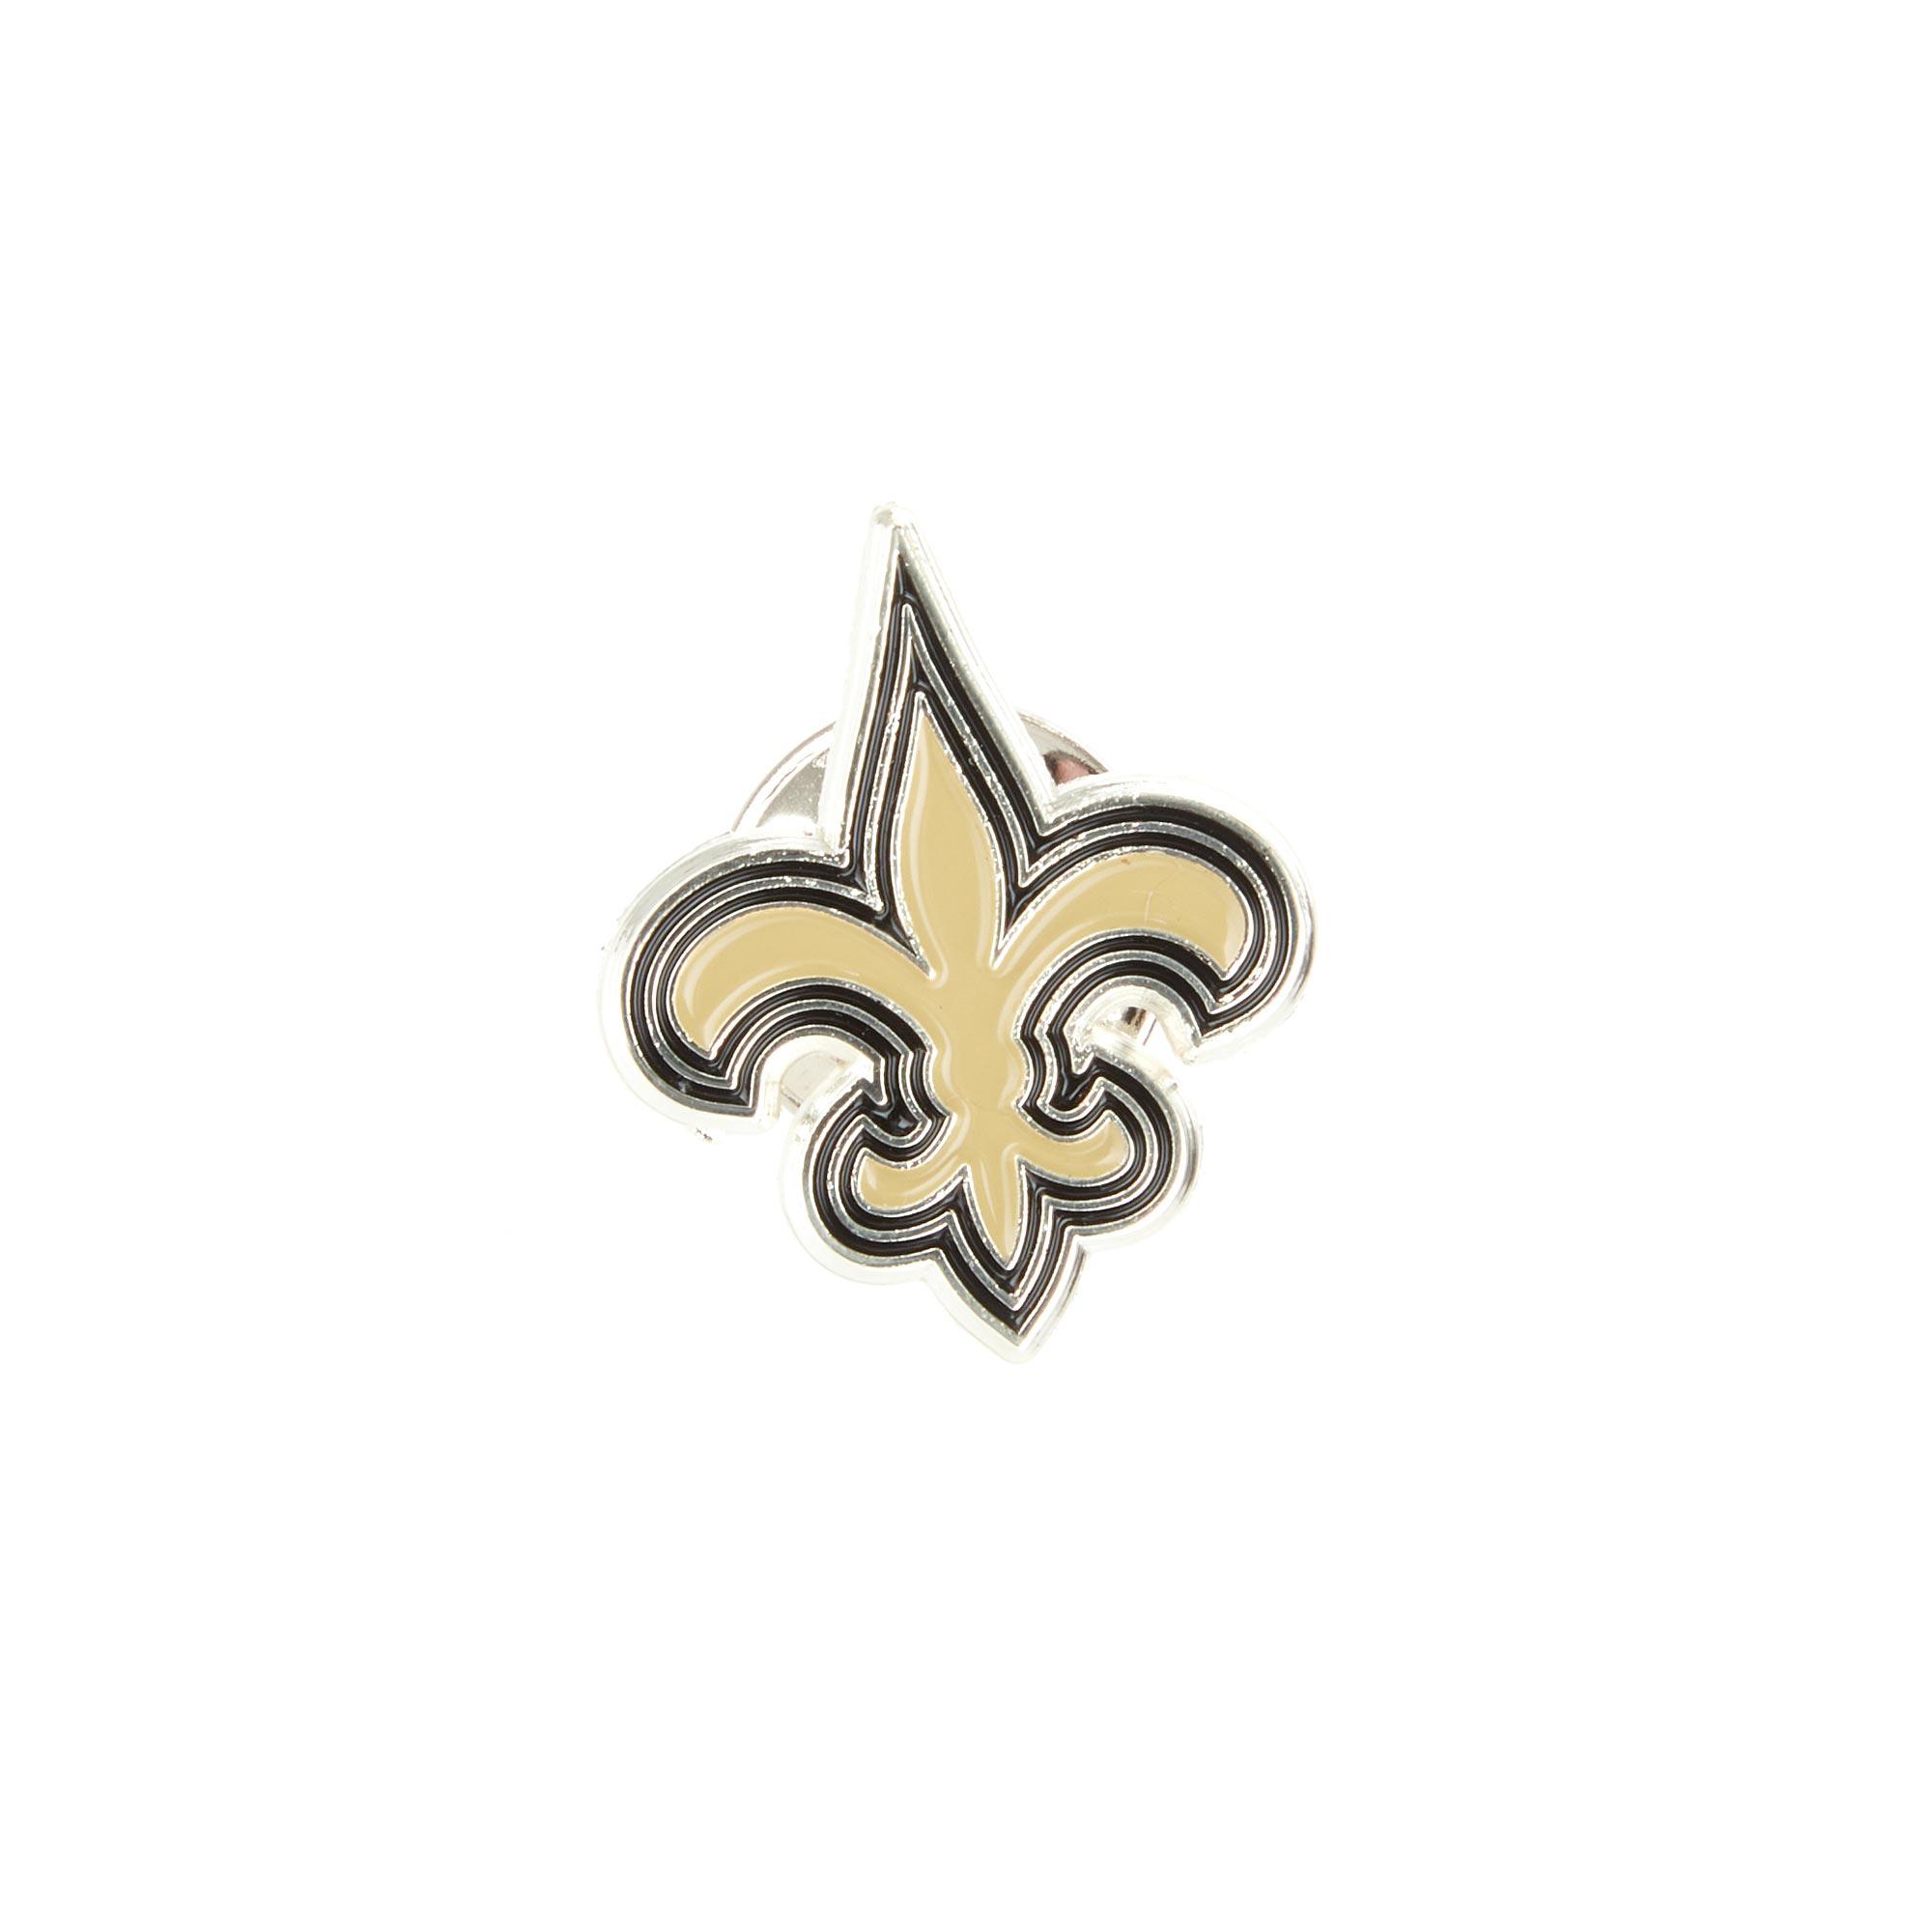 New Orleans Saints Logo Pin Badge